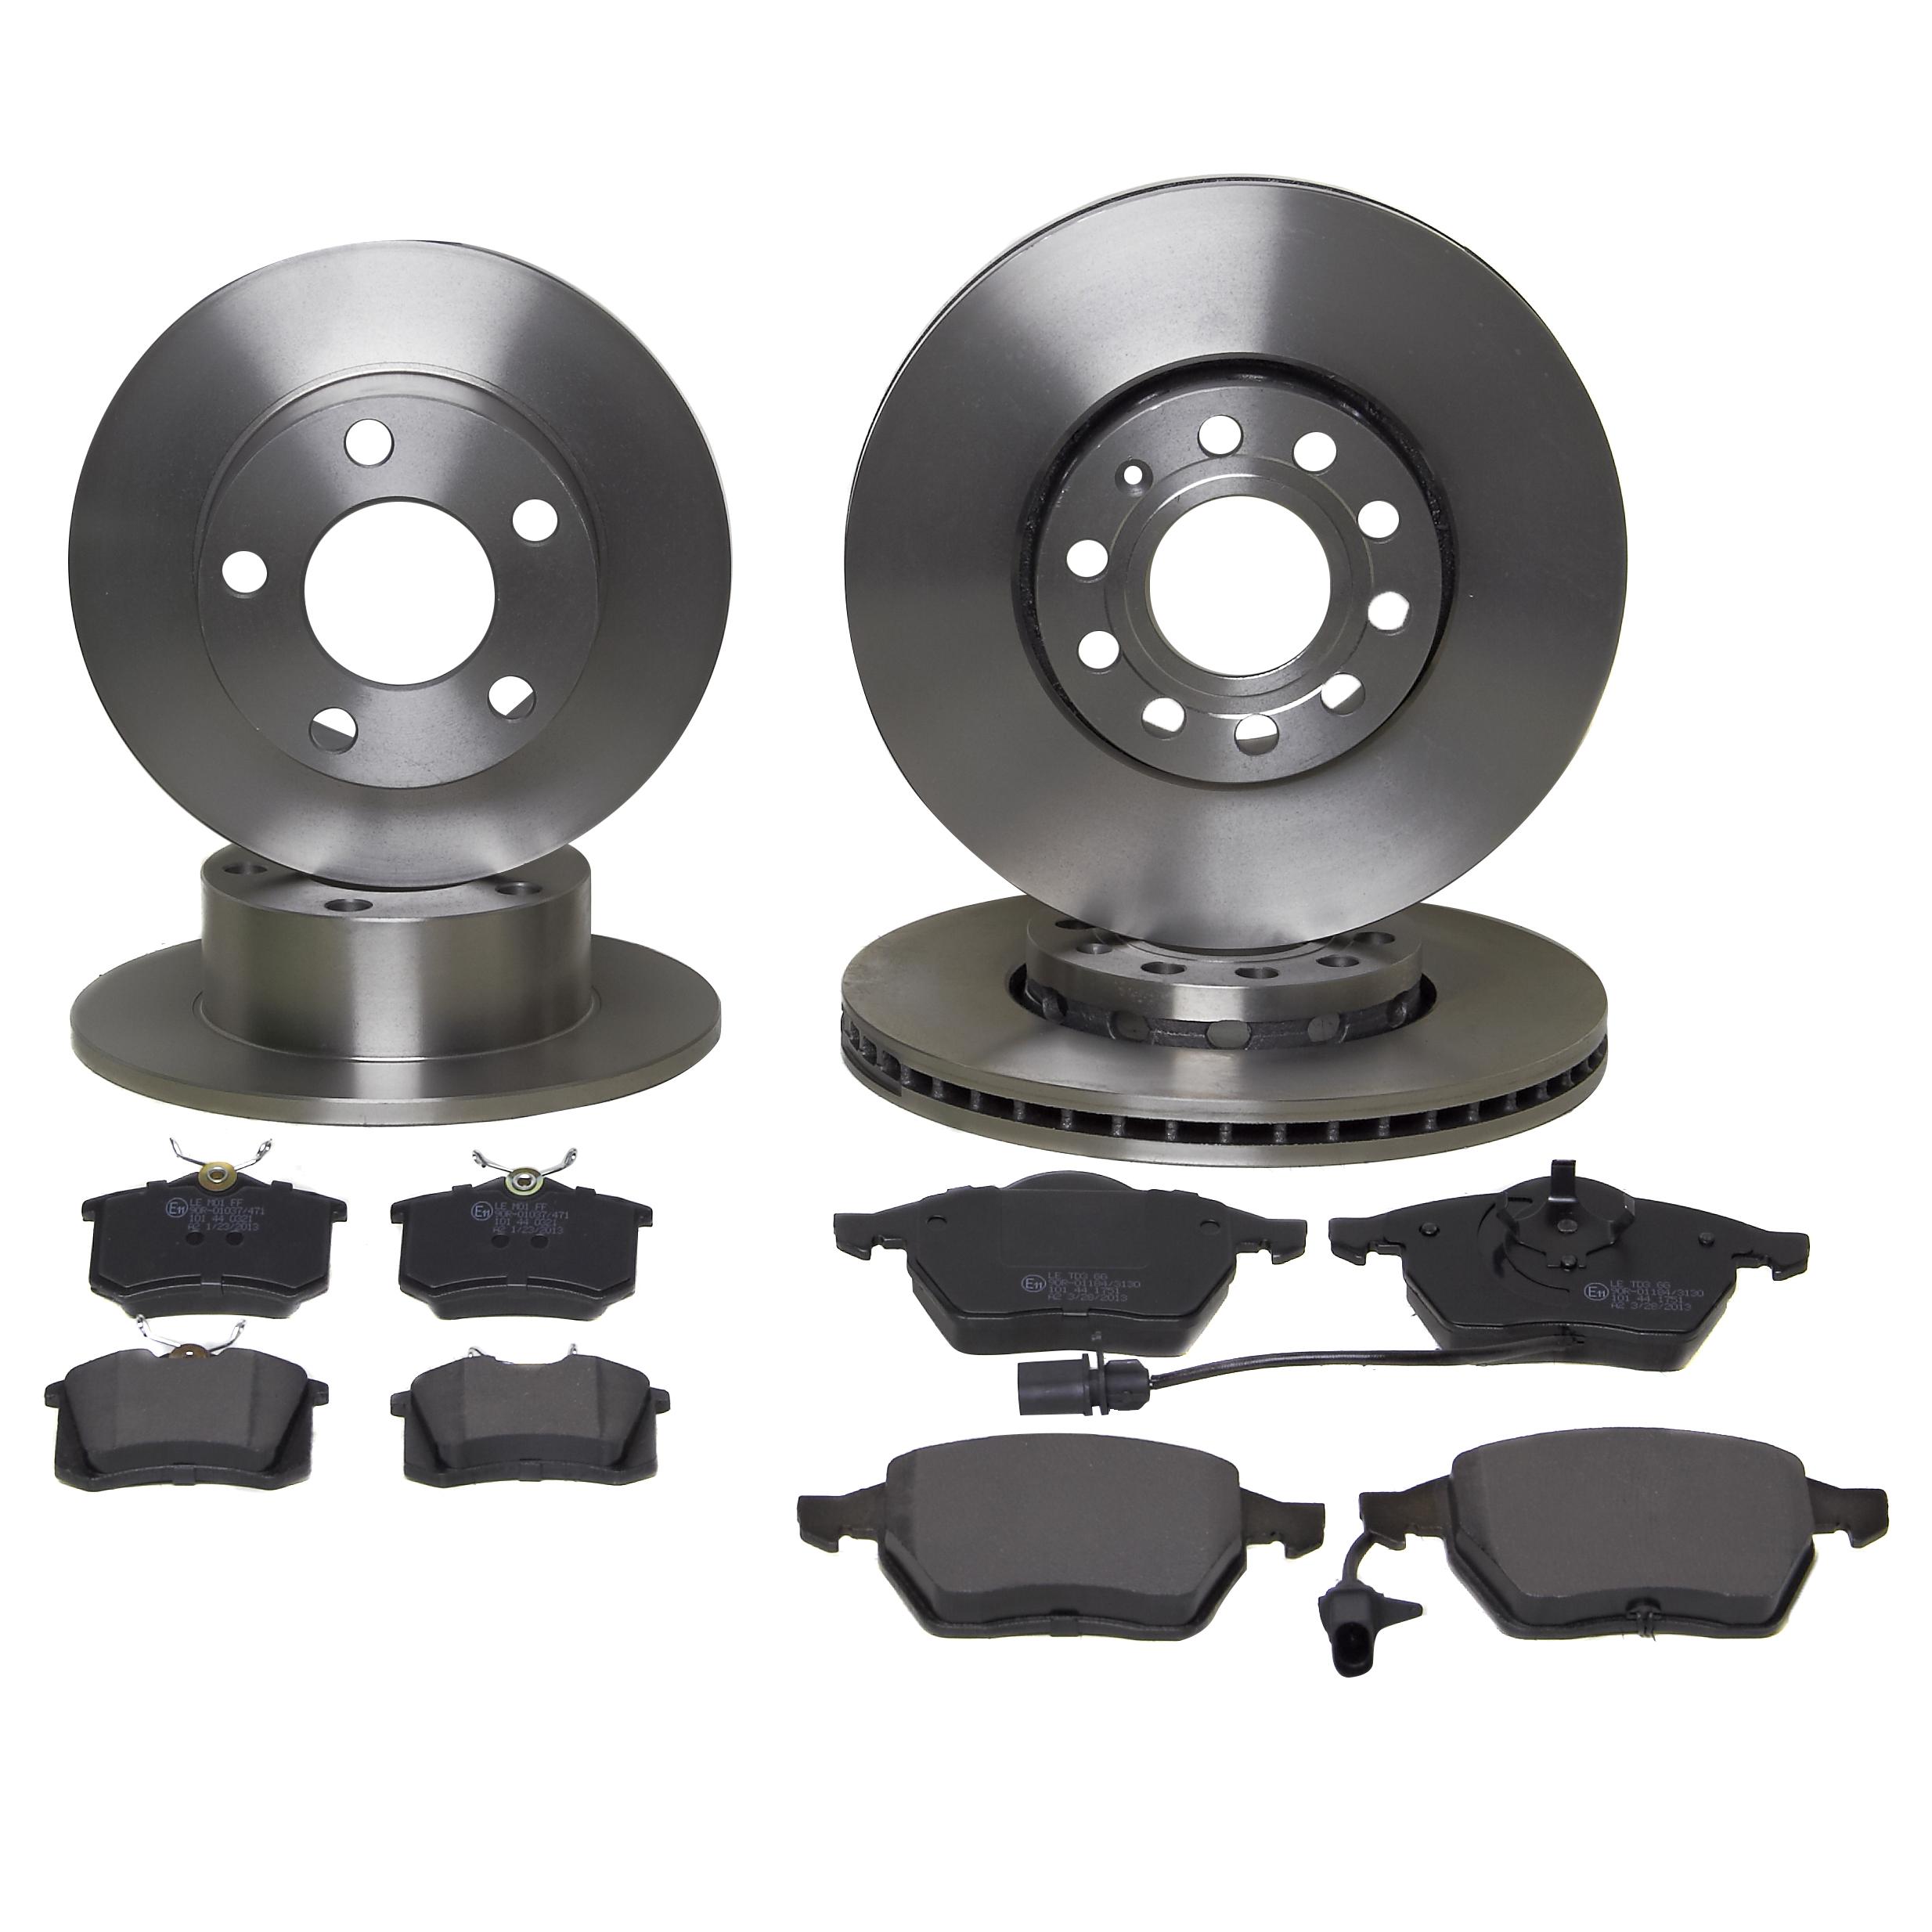 vw passat 1 9 tdi 96 05 eicher front rear brake kit discs pads ebay. Black Bedroom Furniture Sets. Home Design Ideas